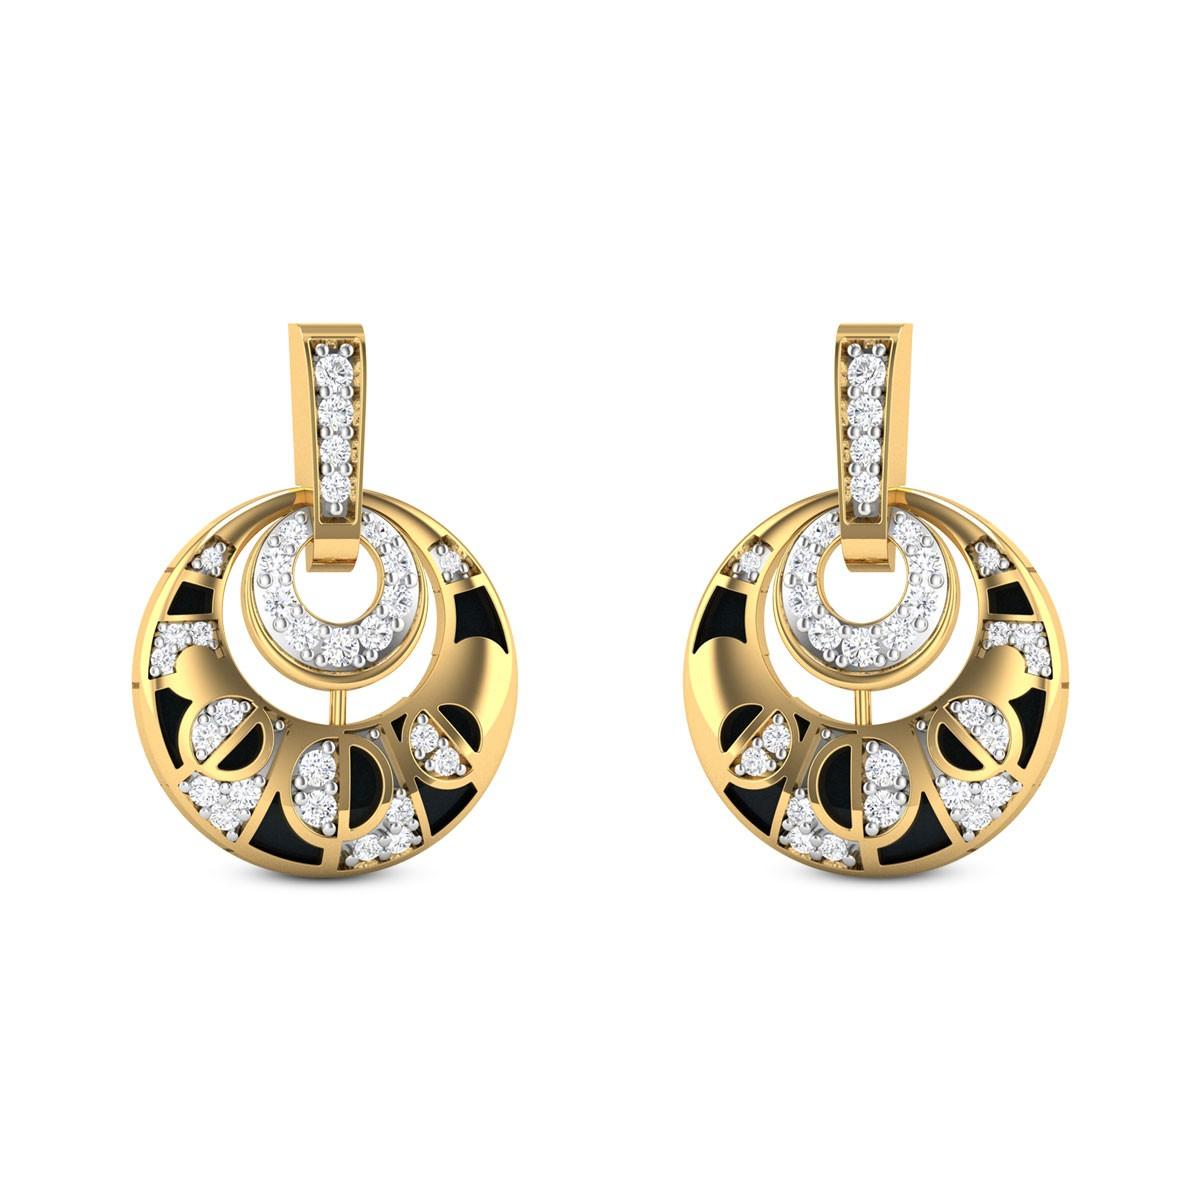 Mie Diamond Earrings